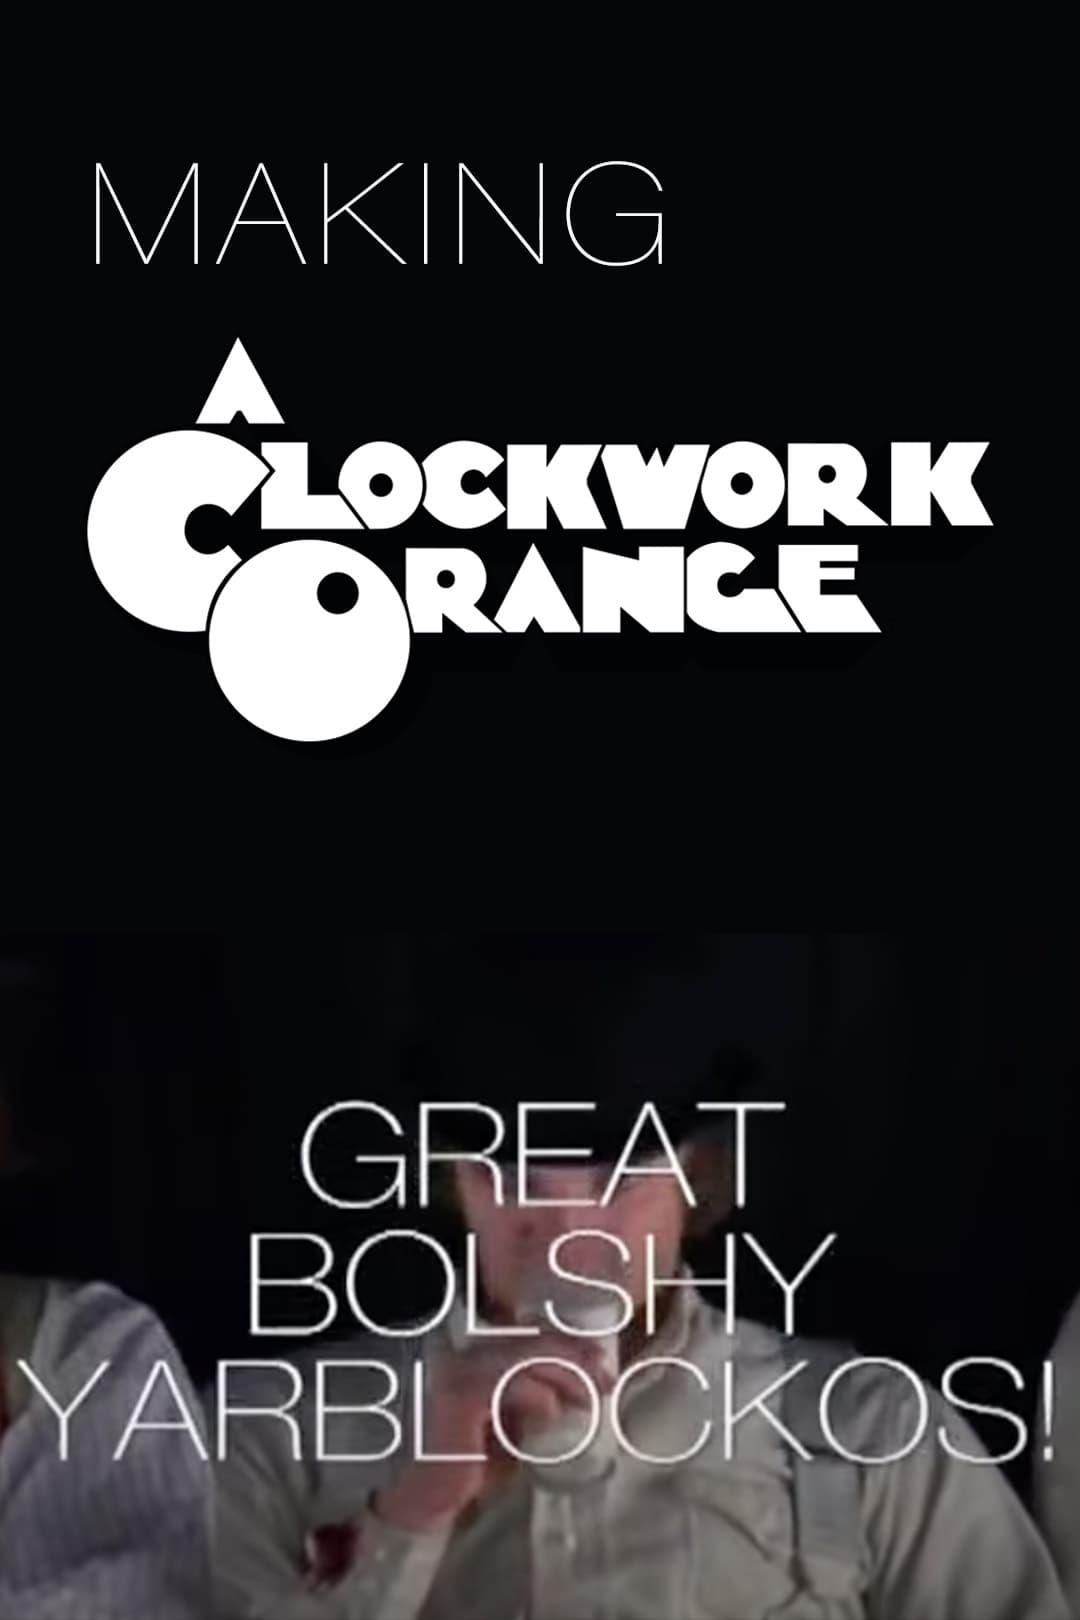 Great Bolshy Yarblockos!: Making A Clockwork Orange